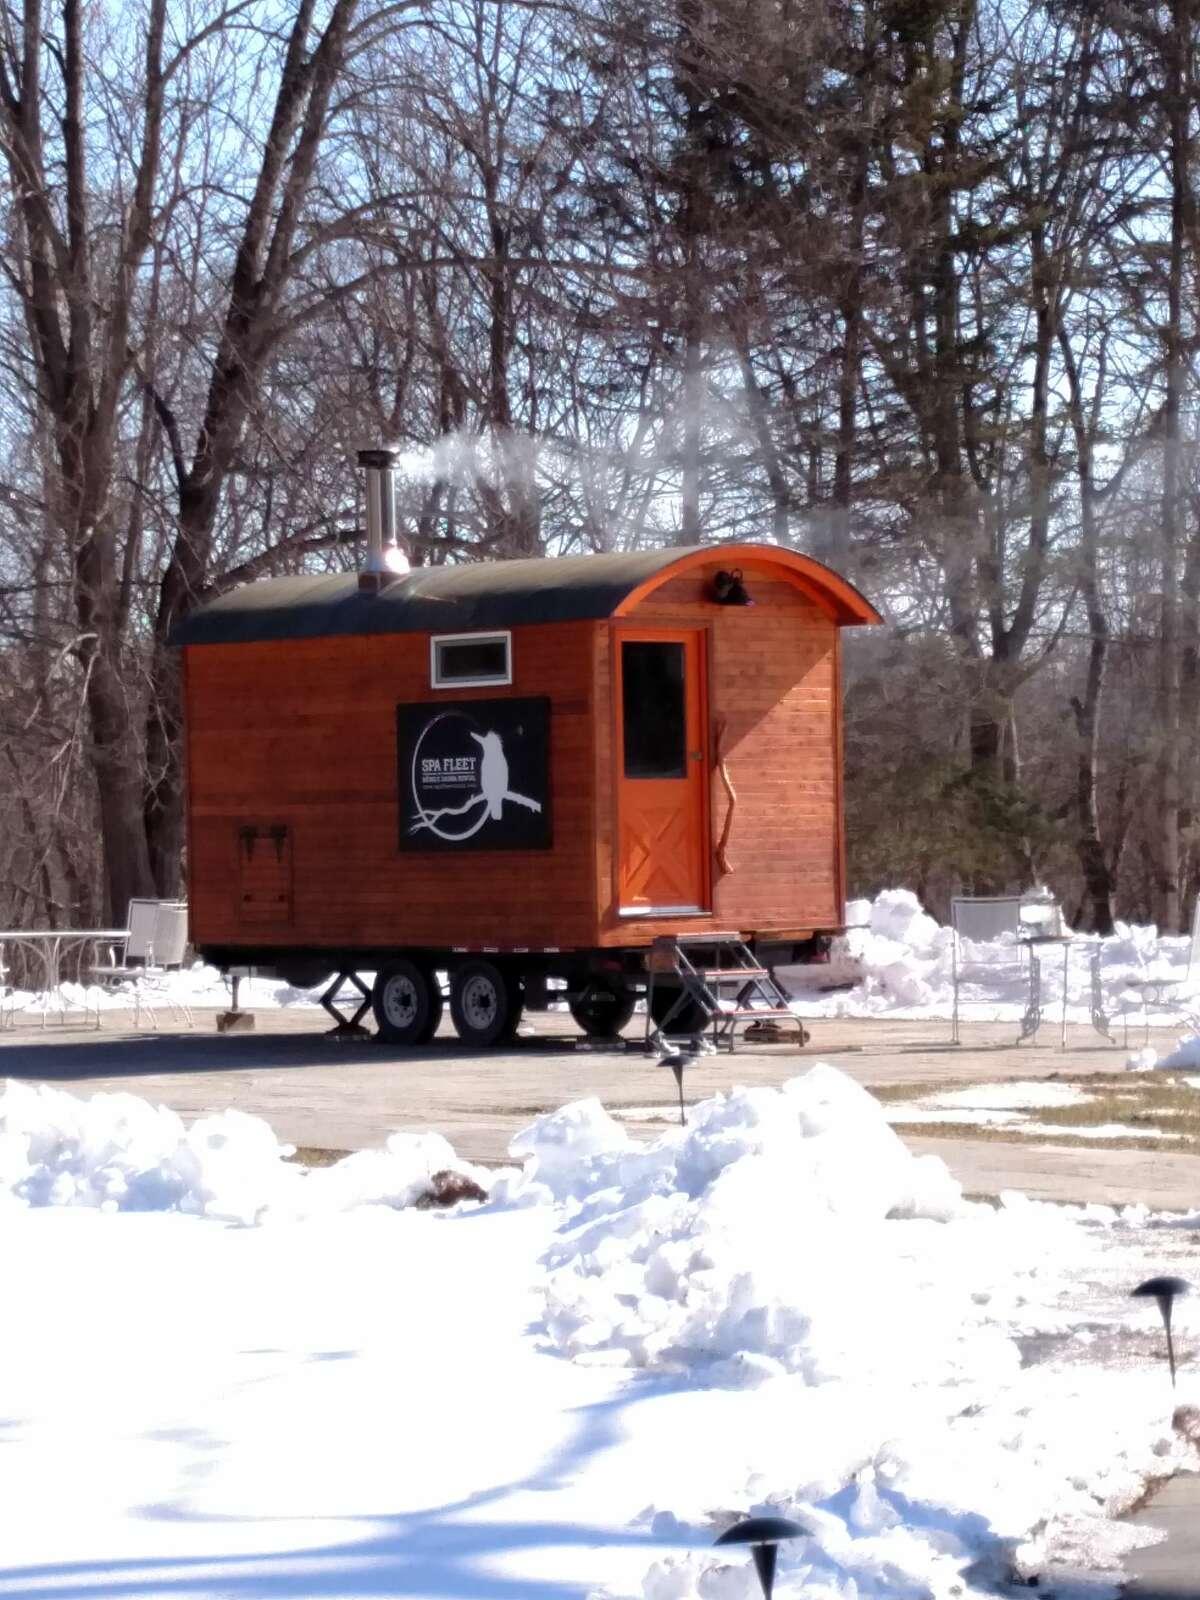 Spa Fleet's Cloudberry mobile sauna.